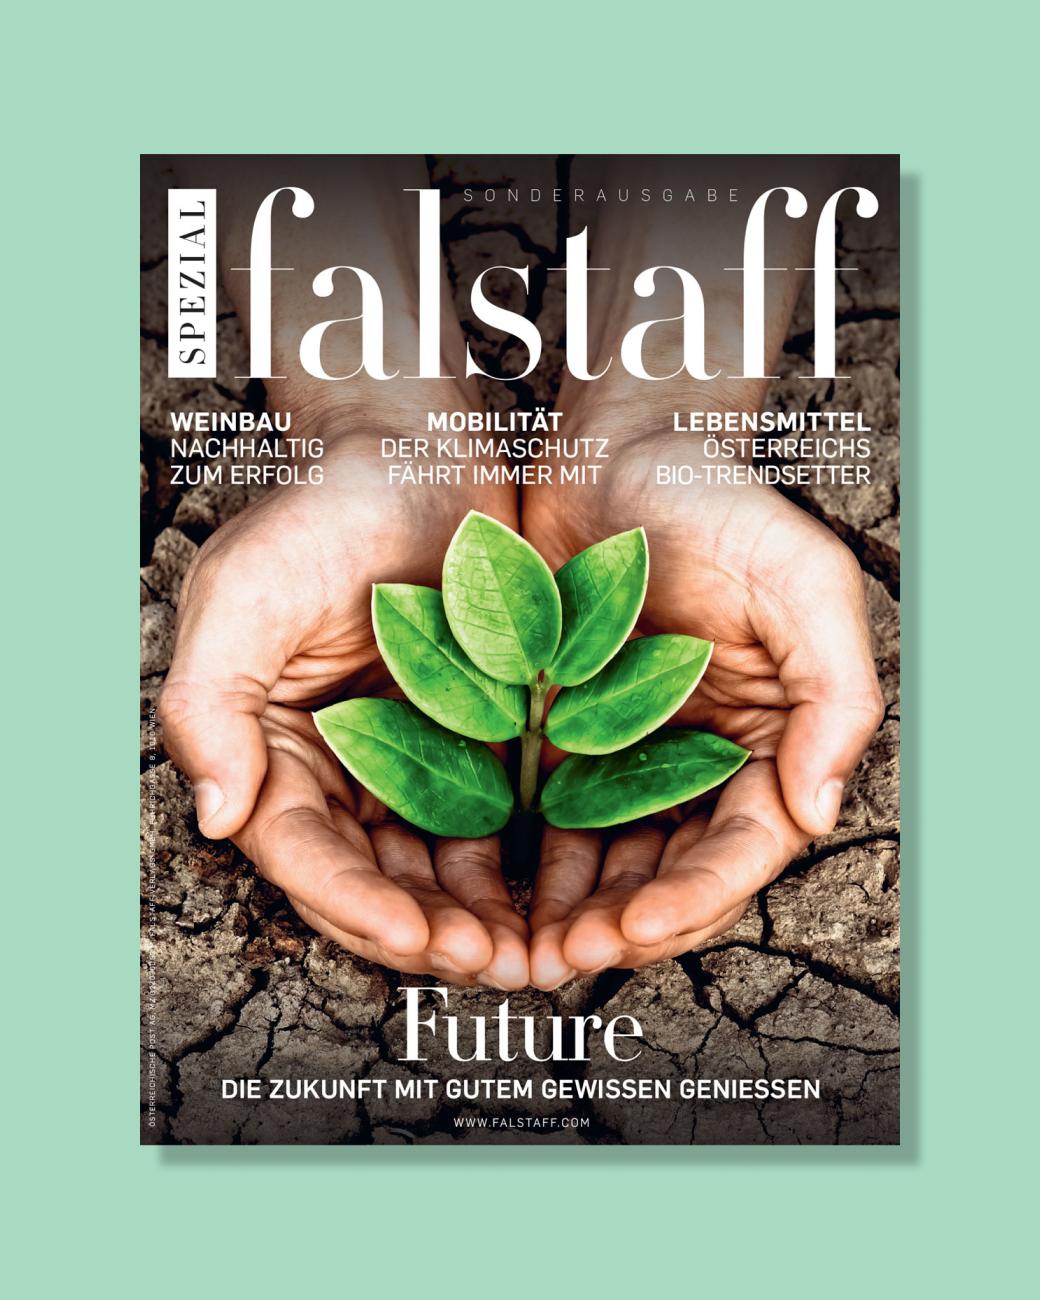 FALLSTAFF — Weinbau, Mobilität, Lebensmittel